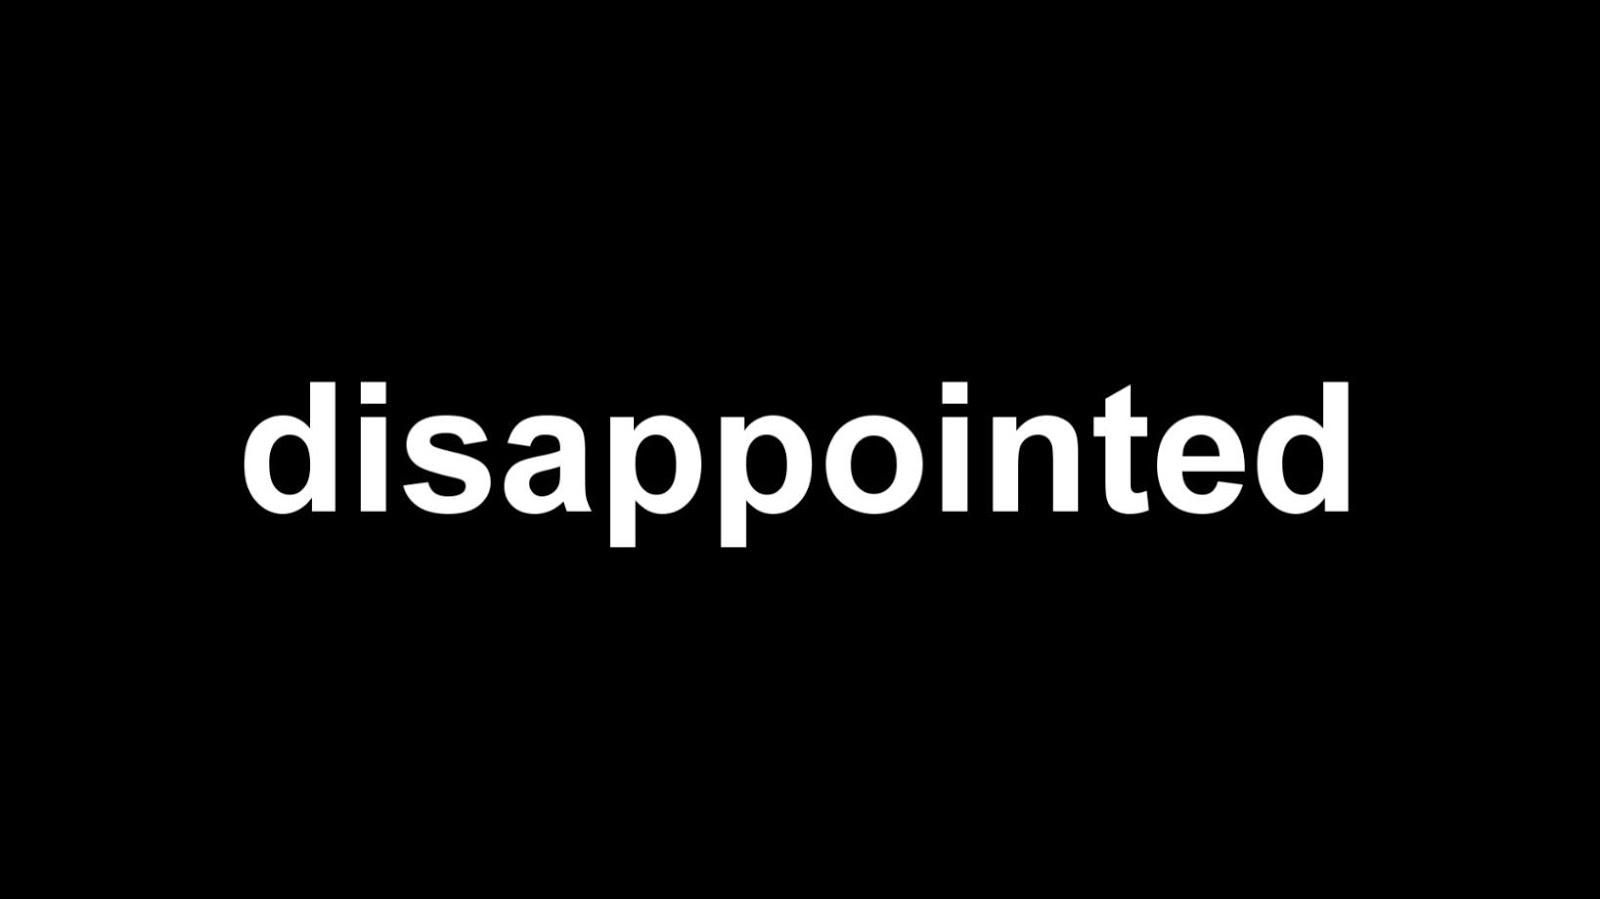 50 Kata Kata Kecewa Dan Sedih Menyentuh Hati Tiphidup